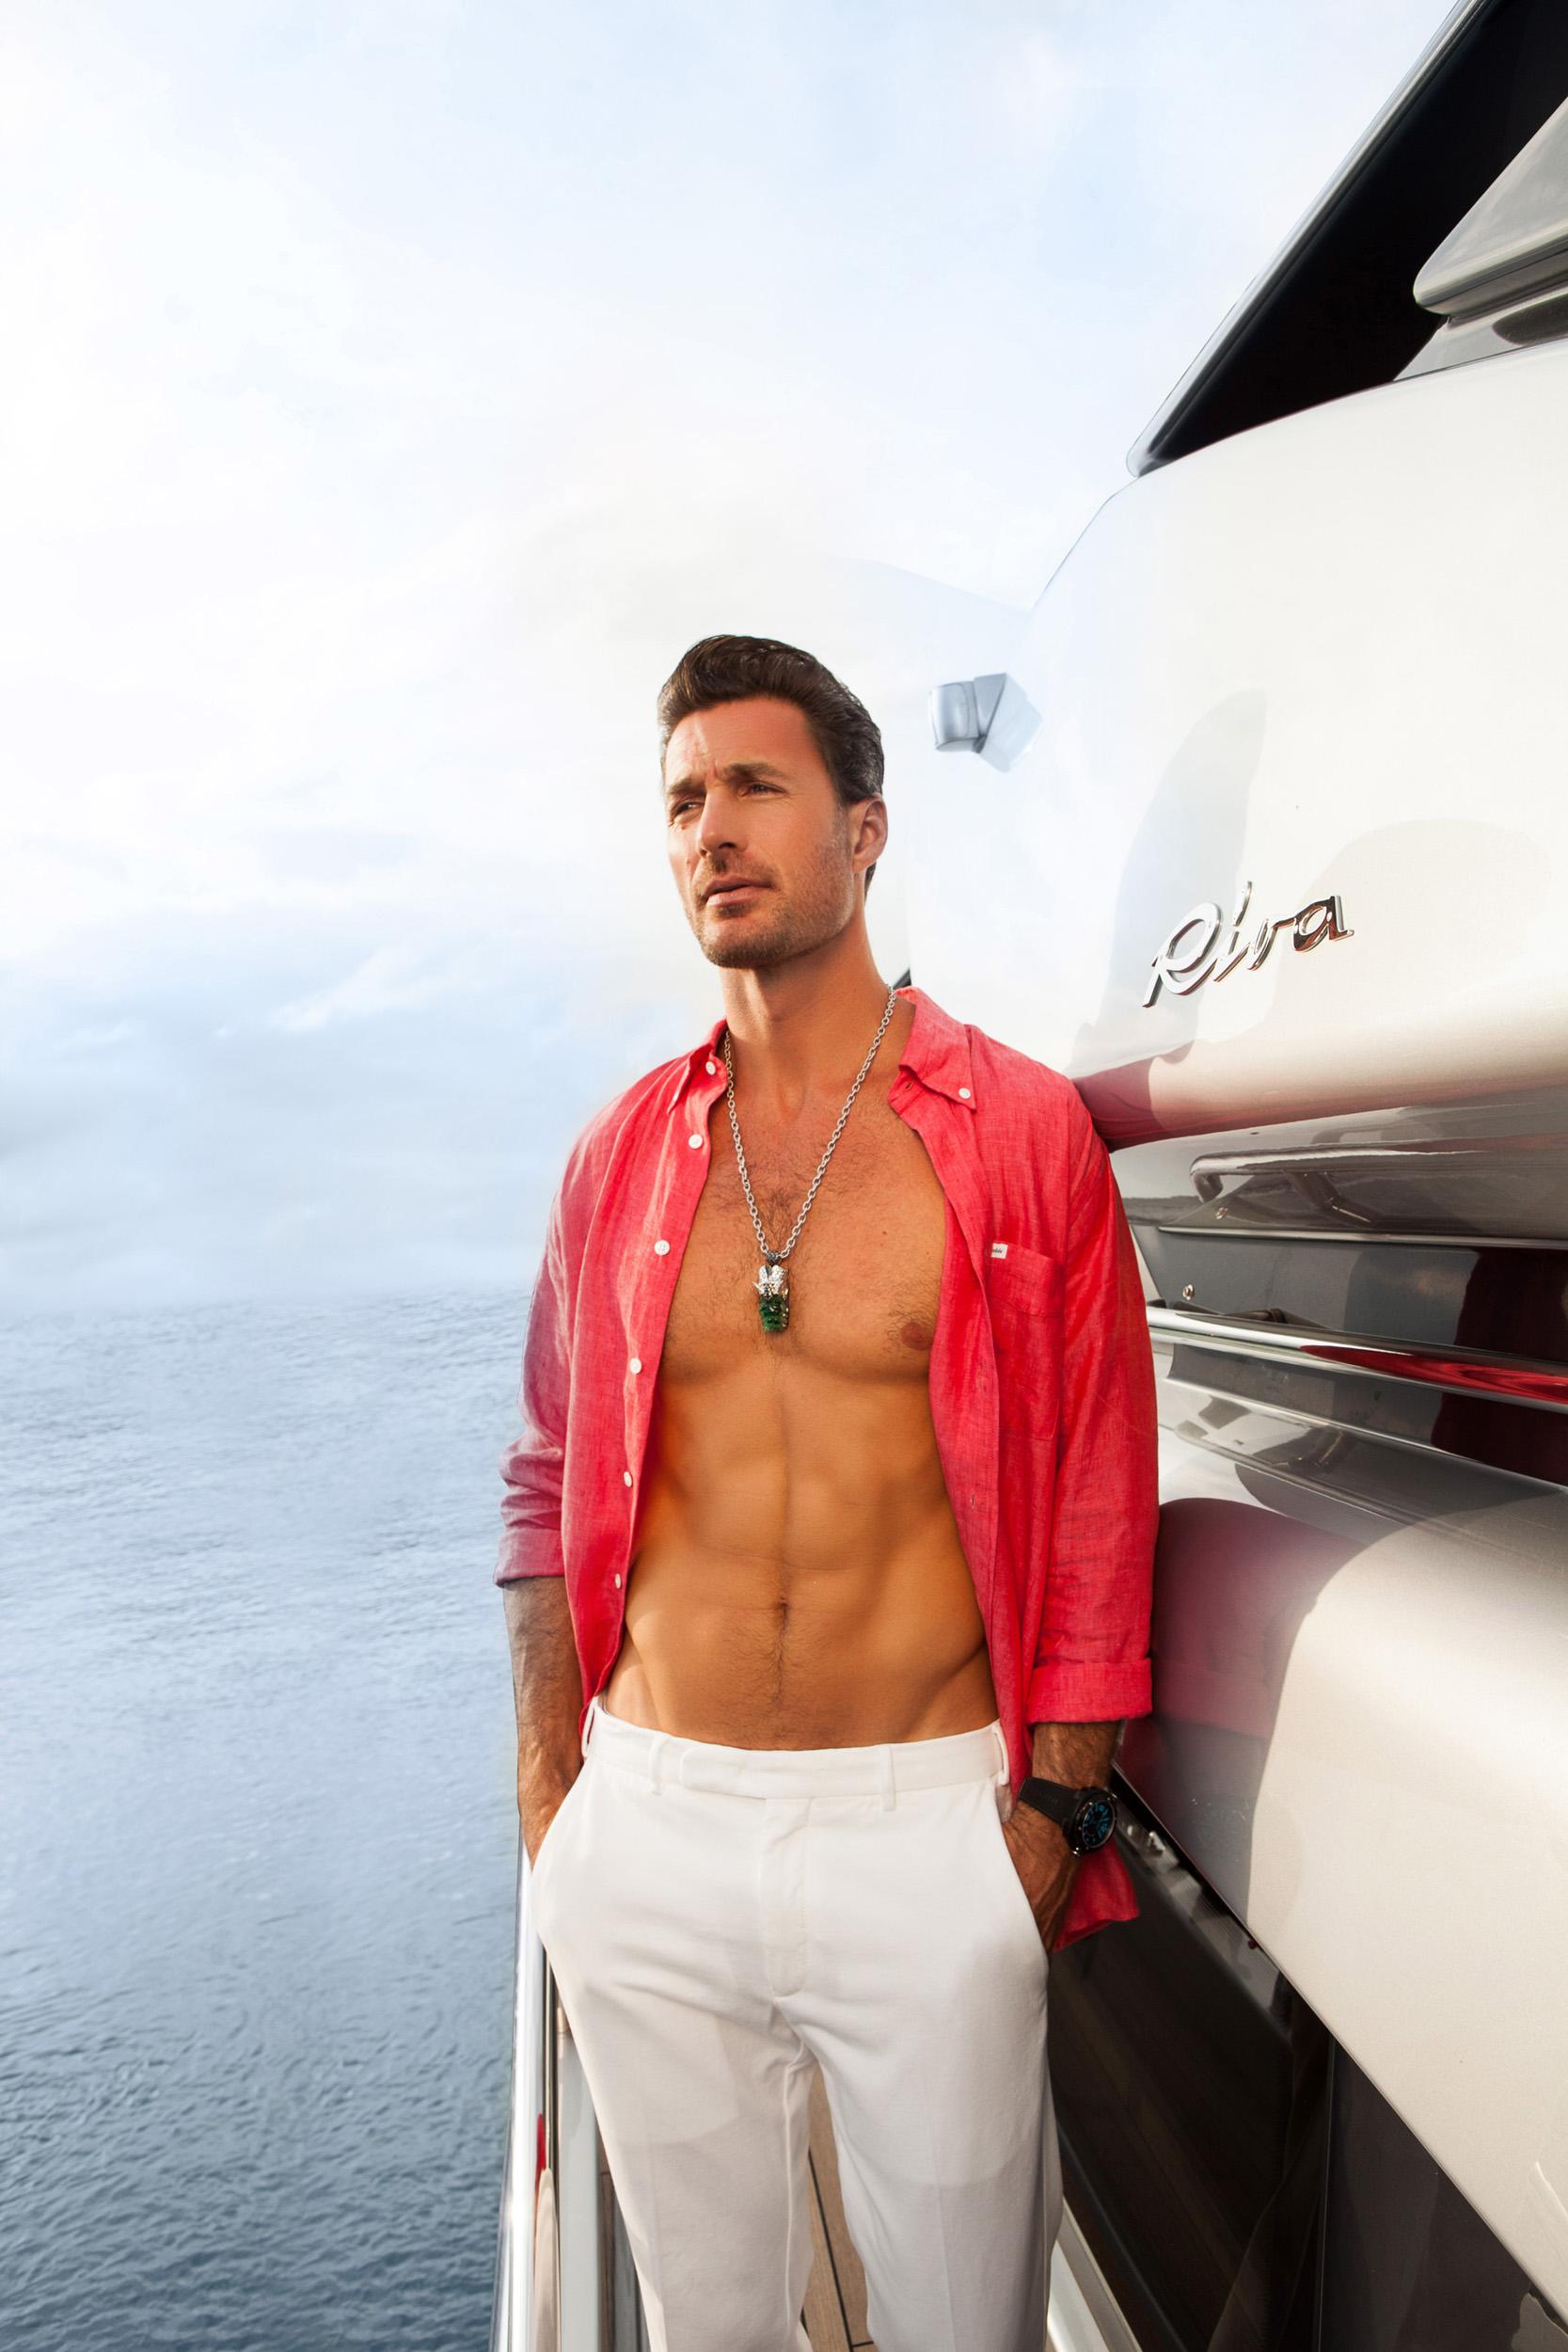 Man_on_yacht_portfolio-5448.jpg